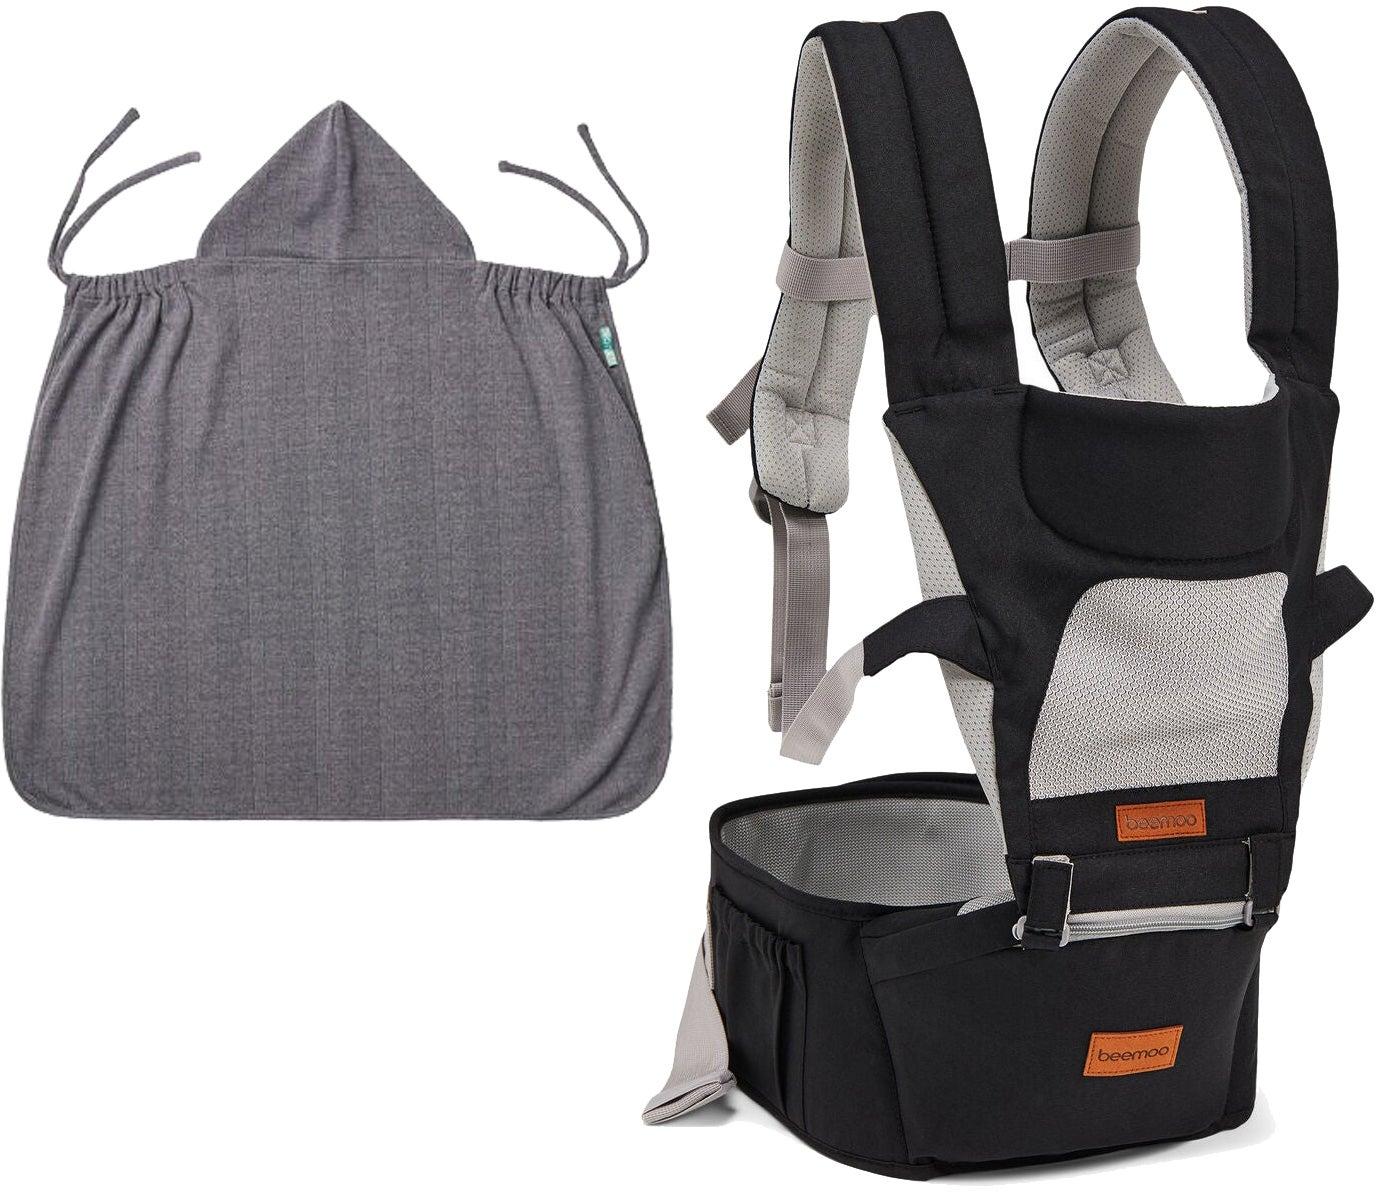 Beemoo Carry Comfort Air Kantoreppu + Päällinen, Black